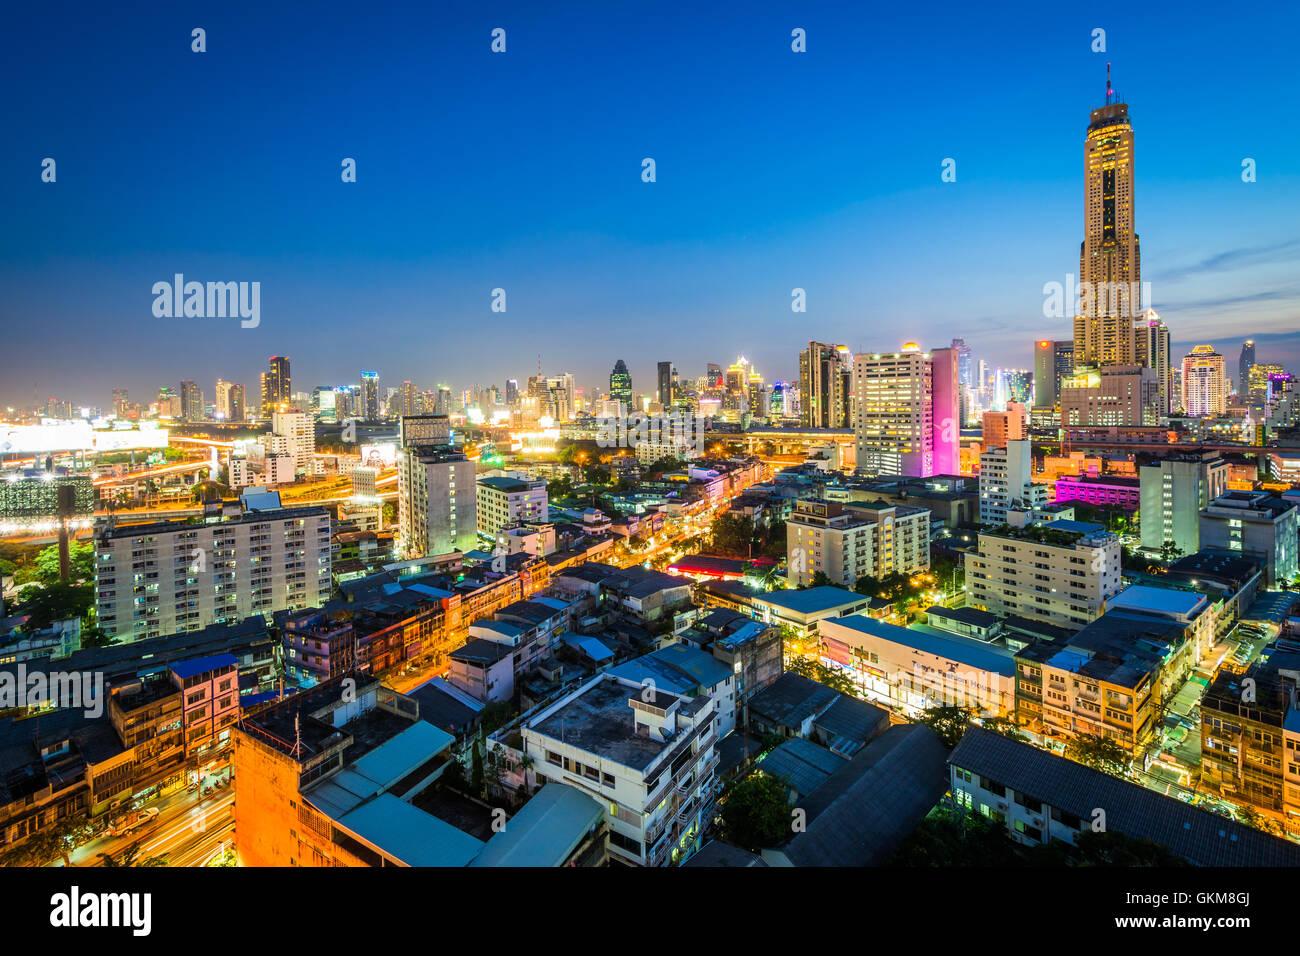 Vista de la Ratchathewi District en penumbra, en Bangkok, Tailandia. Imagen De Stock